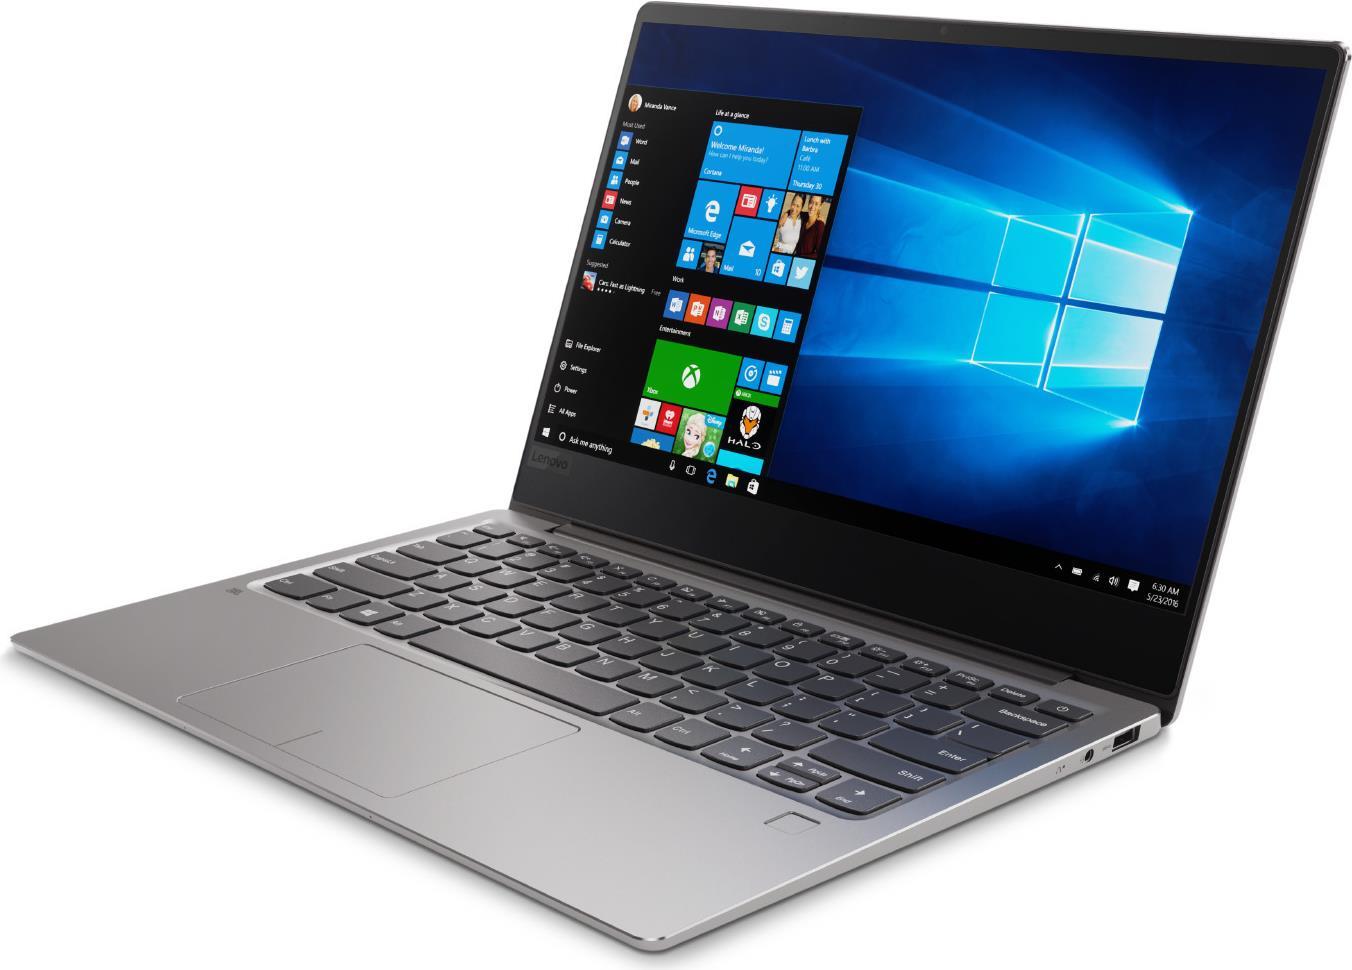 "[NBB] Lenovo 720S-13ARR 81BR002HGE 13.3"" Full HD IPS, Ryzen 5 2500U, 8GB, 512GB SSD, Win 10"